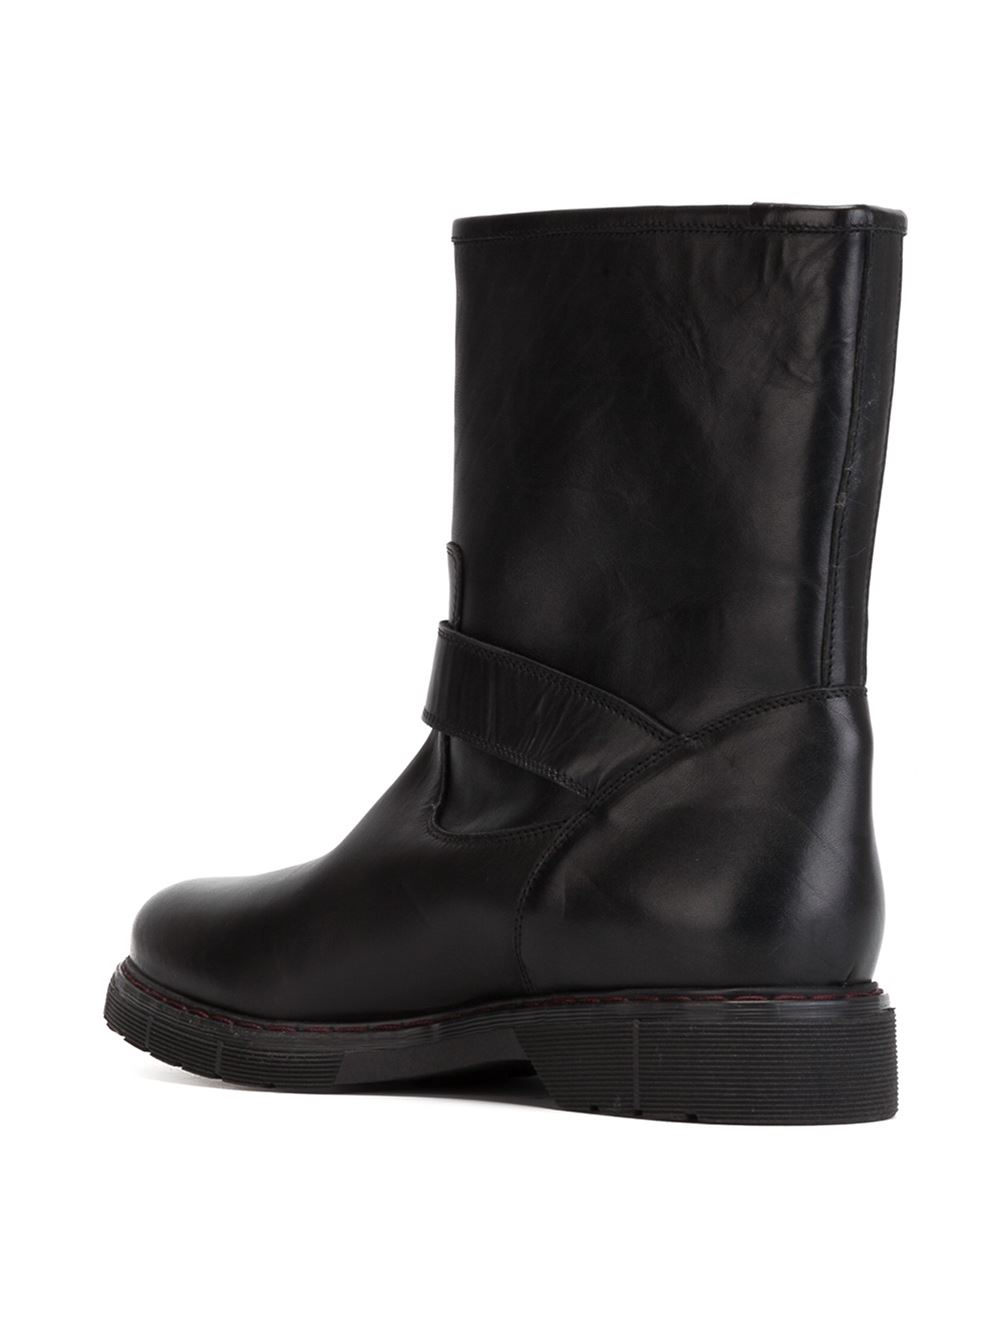 L\'autre chose Buckled Biker Boots in Black | Lyst